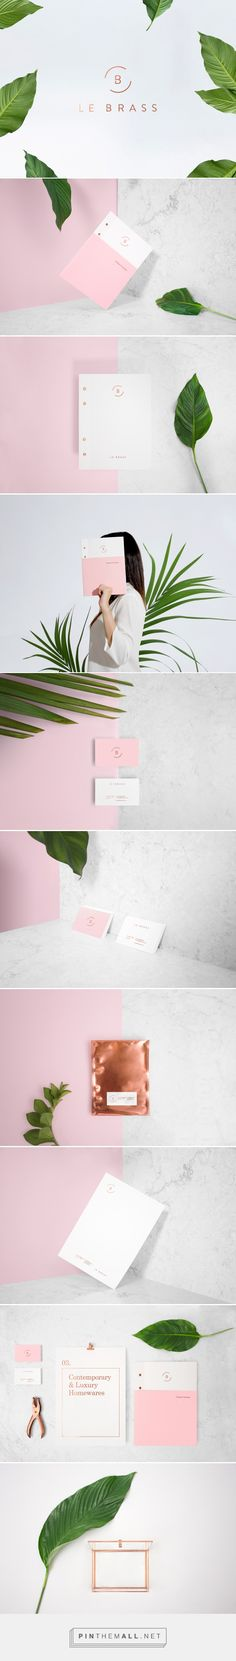 Le Brass Branding by Tatabi Studio | Fivestar Branding – Design and Branding Agency & Inspiration Gallery